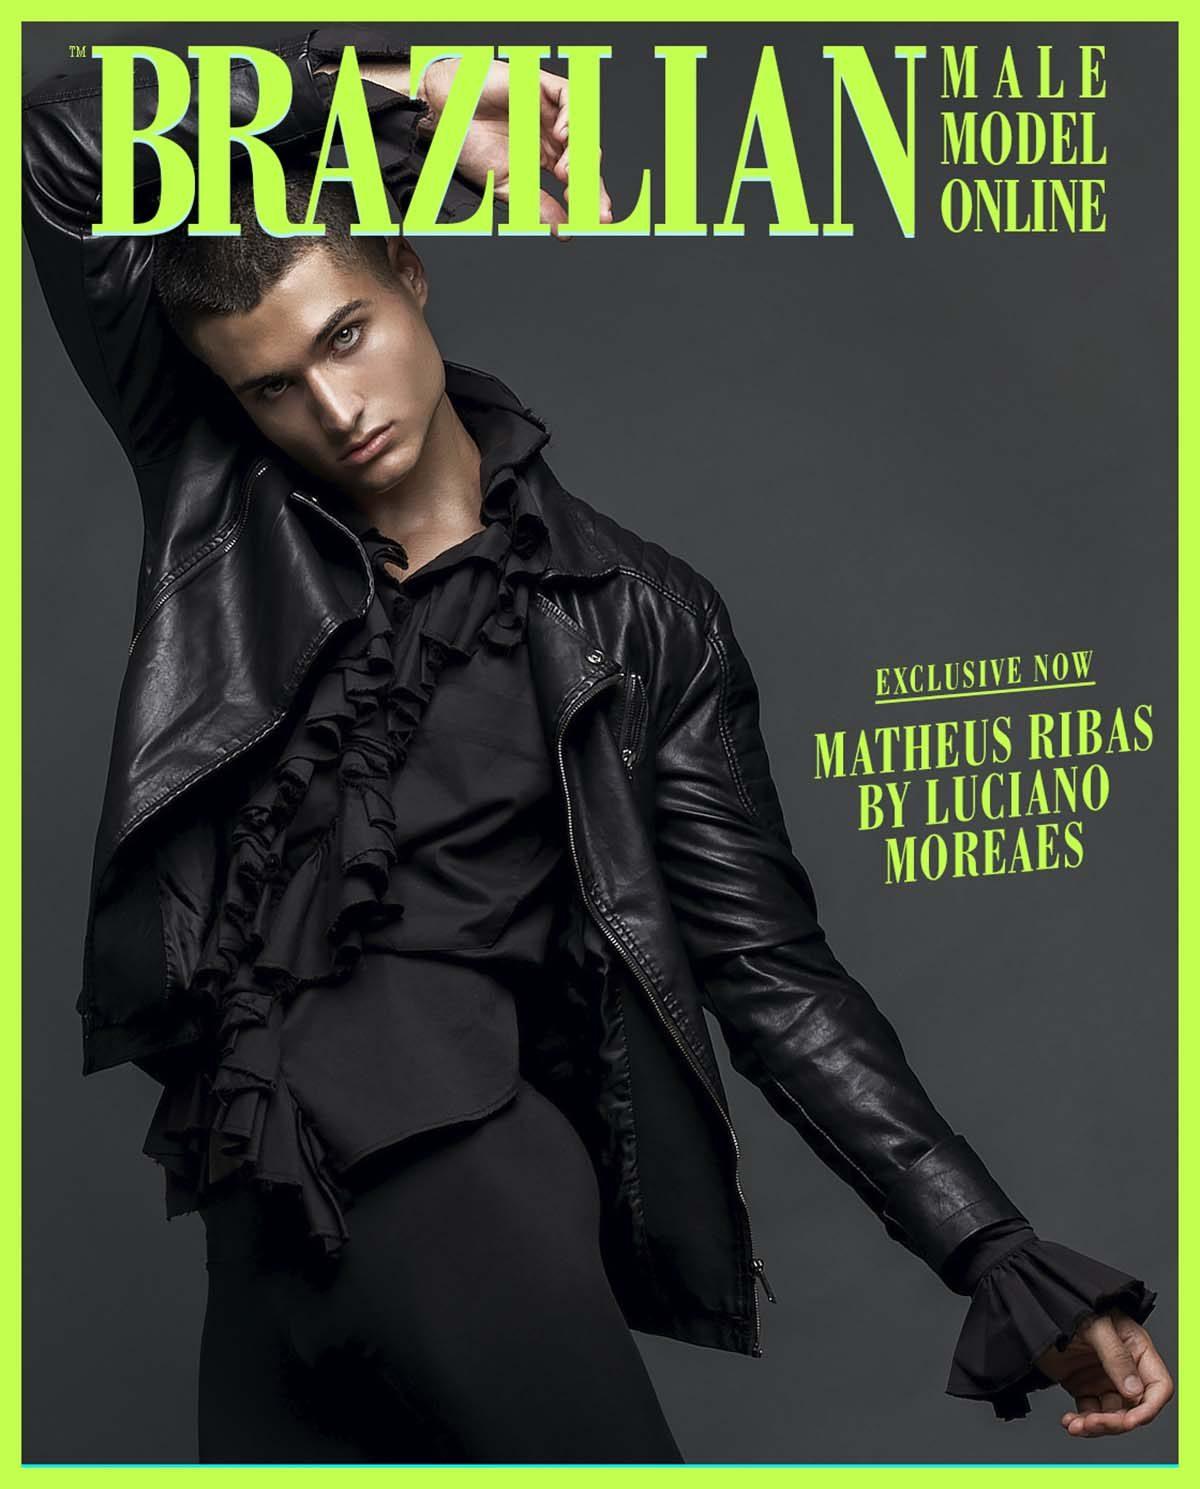 Matheus Ribas by Luciano Moraes